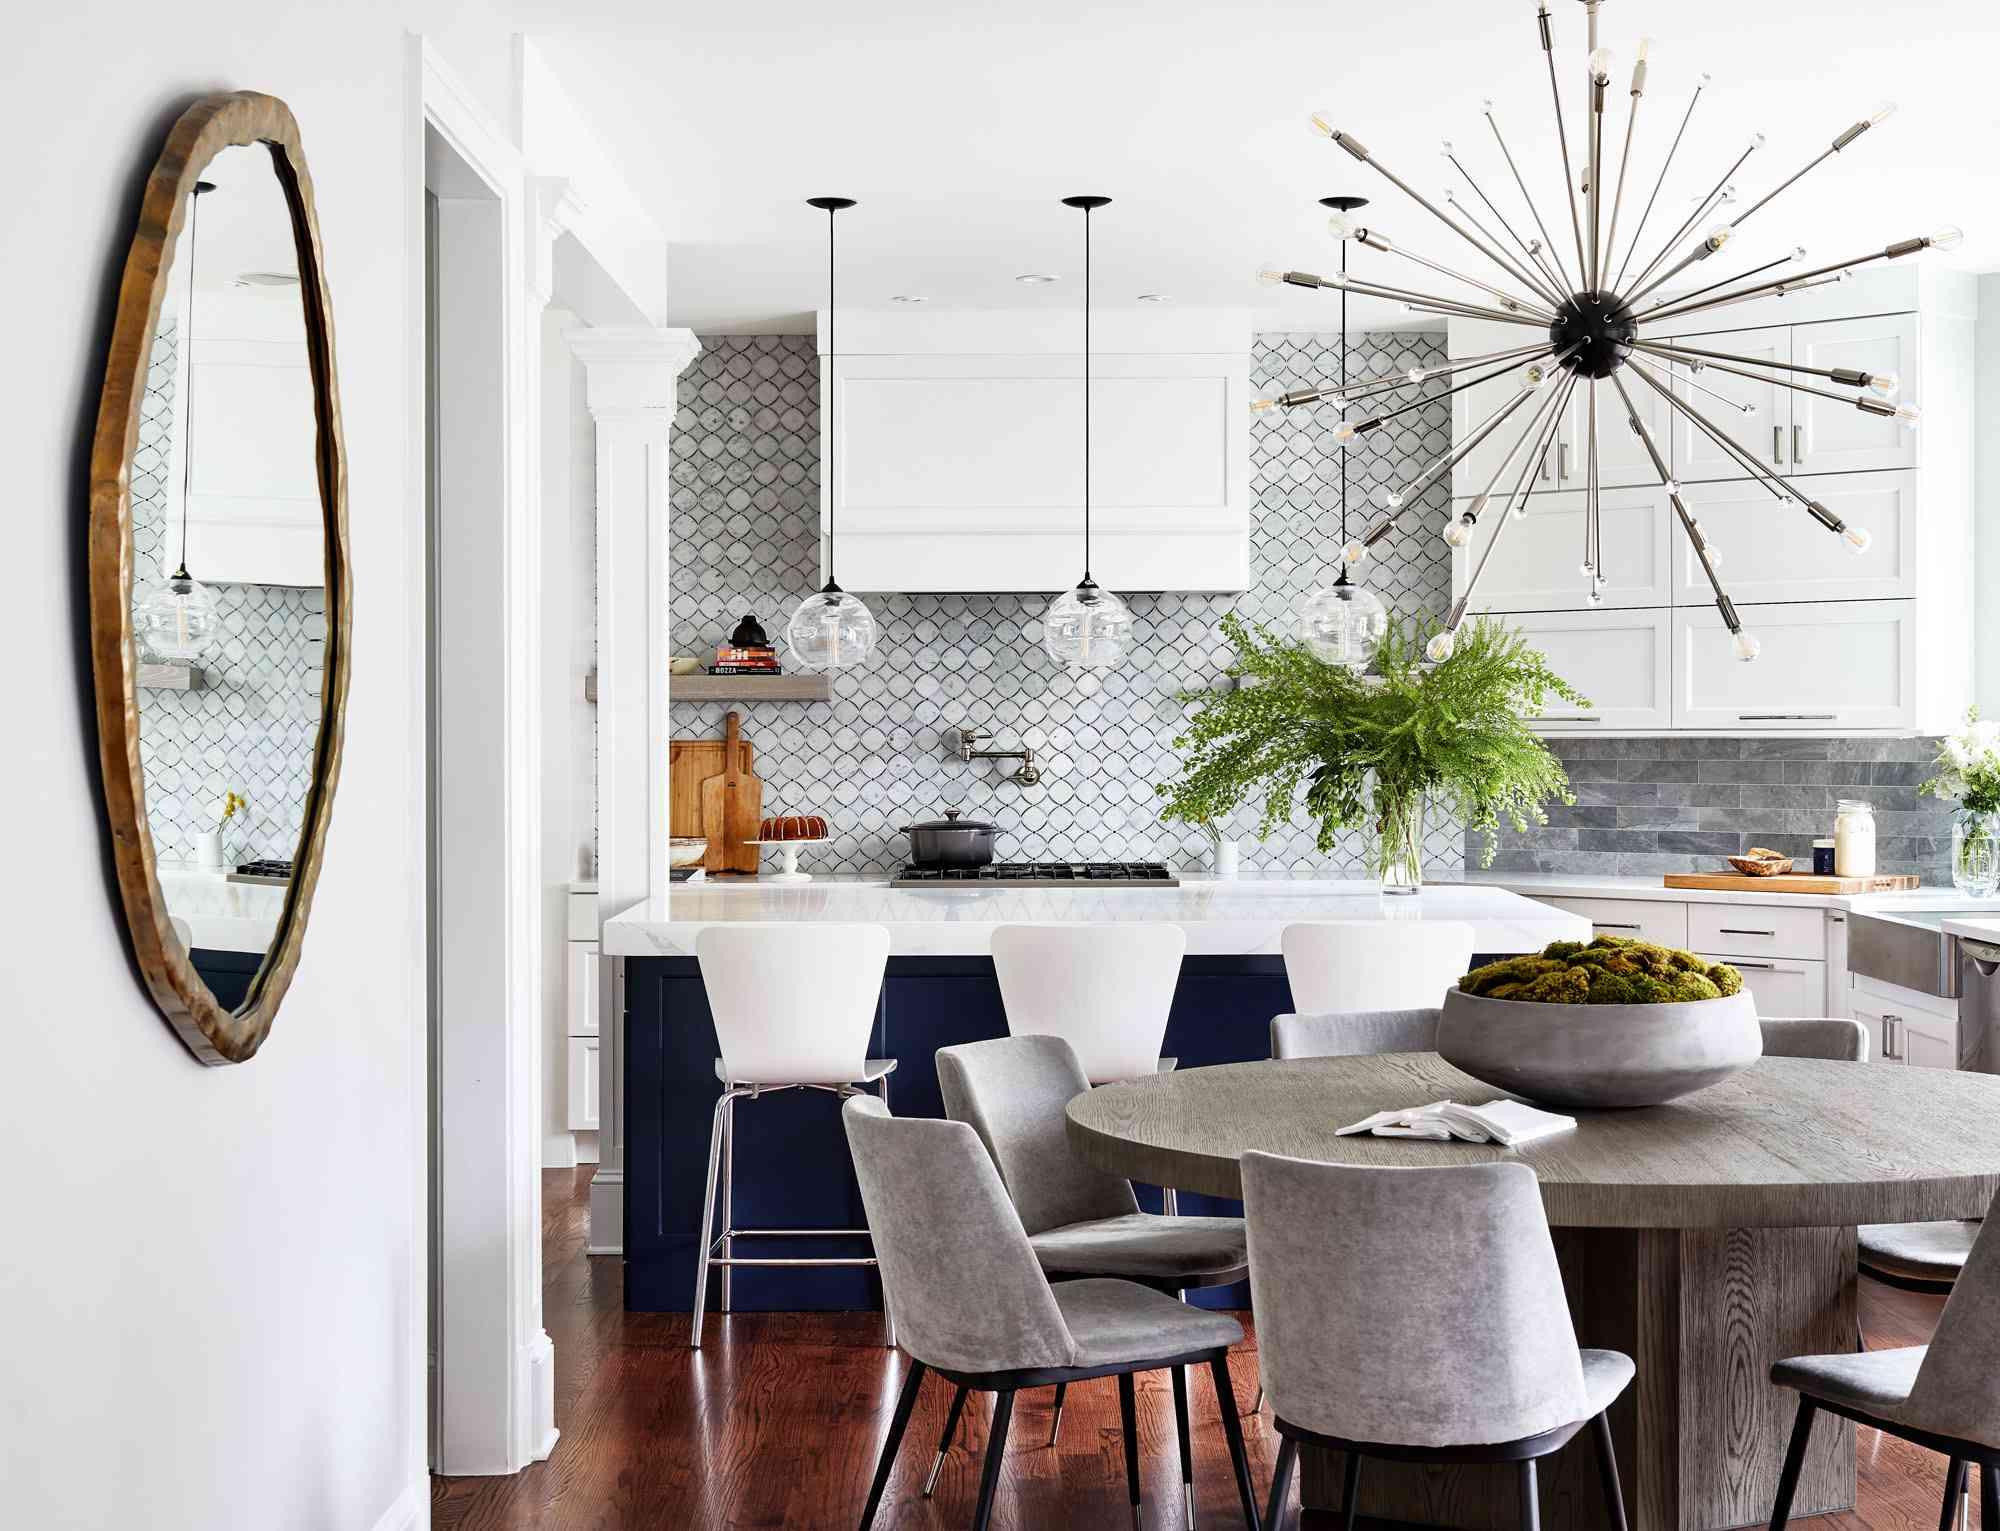 White, gray, and blue kitchen